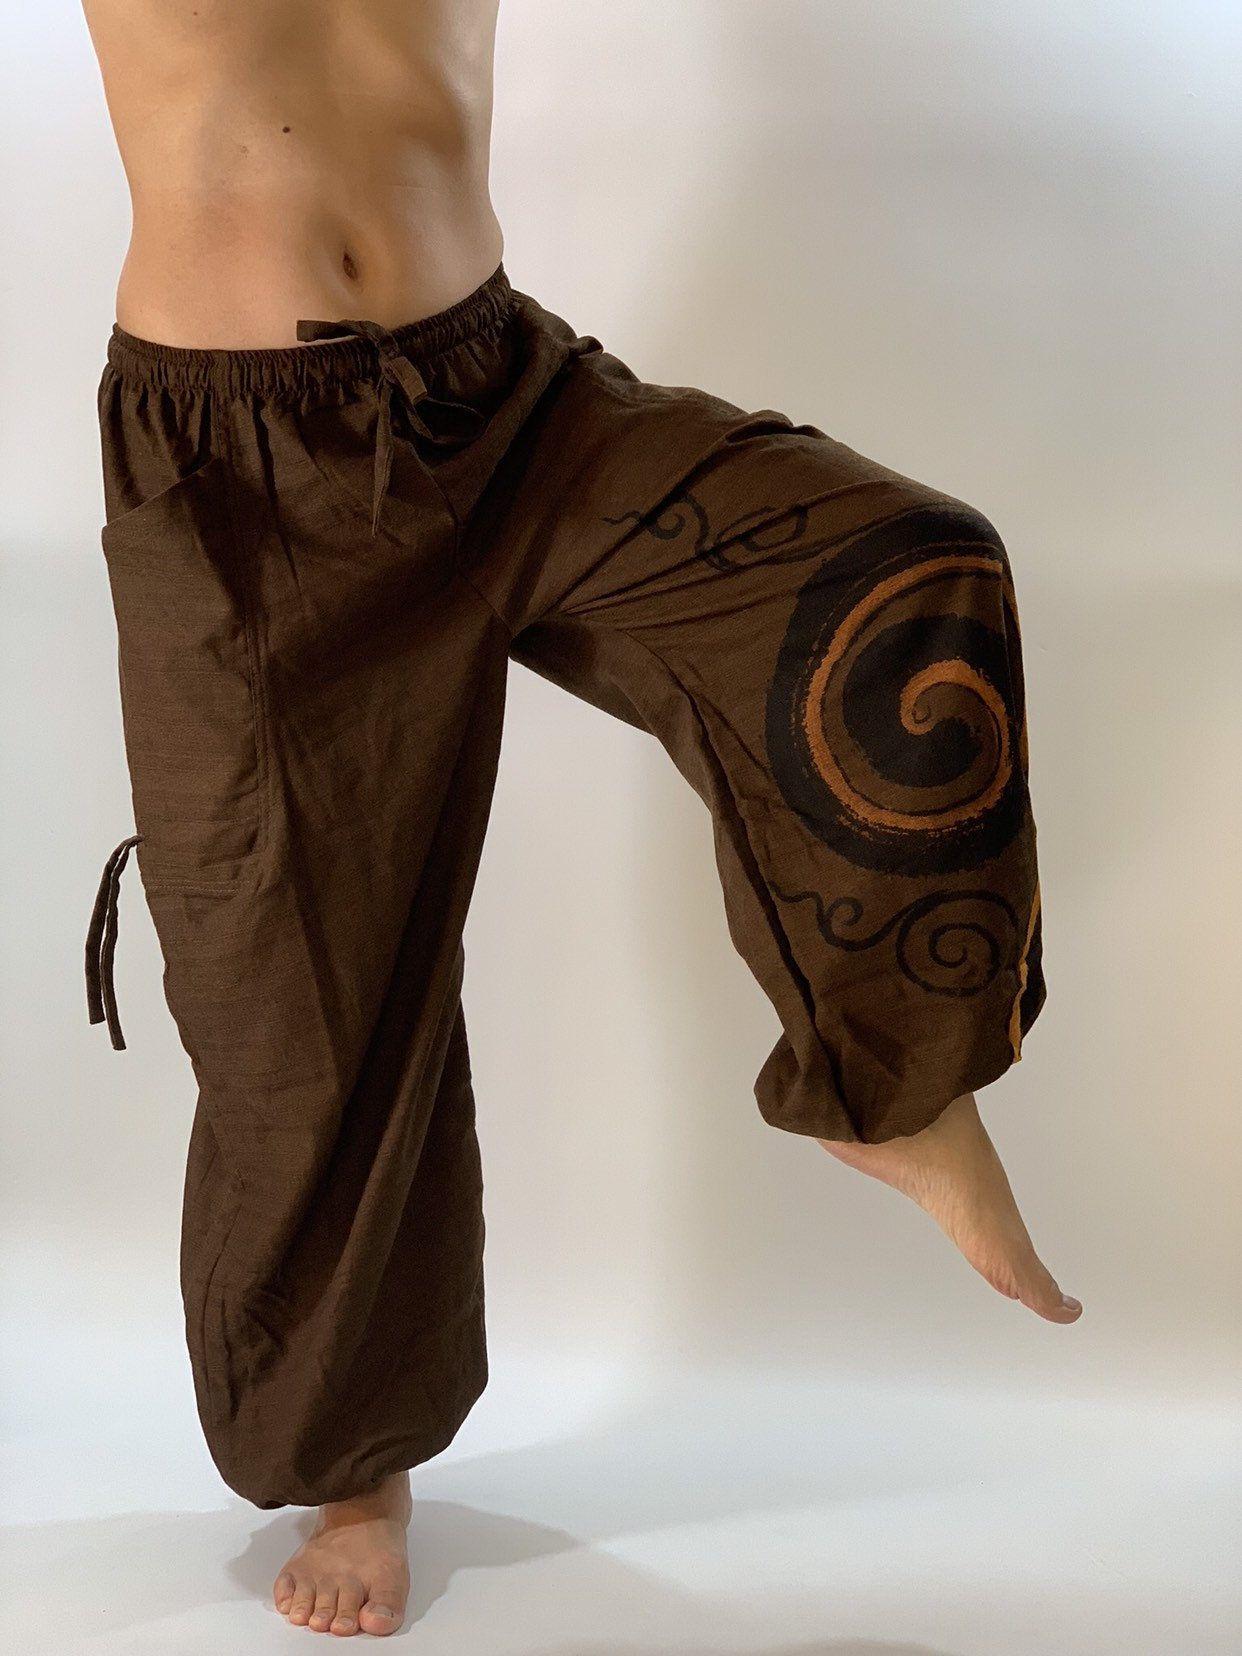 Elephant Lightweight Baggy Stretchy Rayon Harem Yoga Pants Trousers